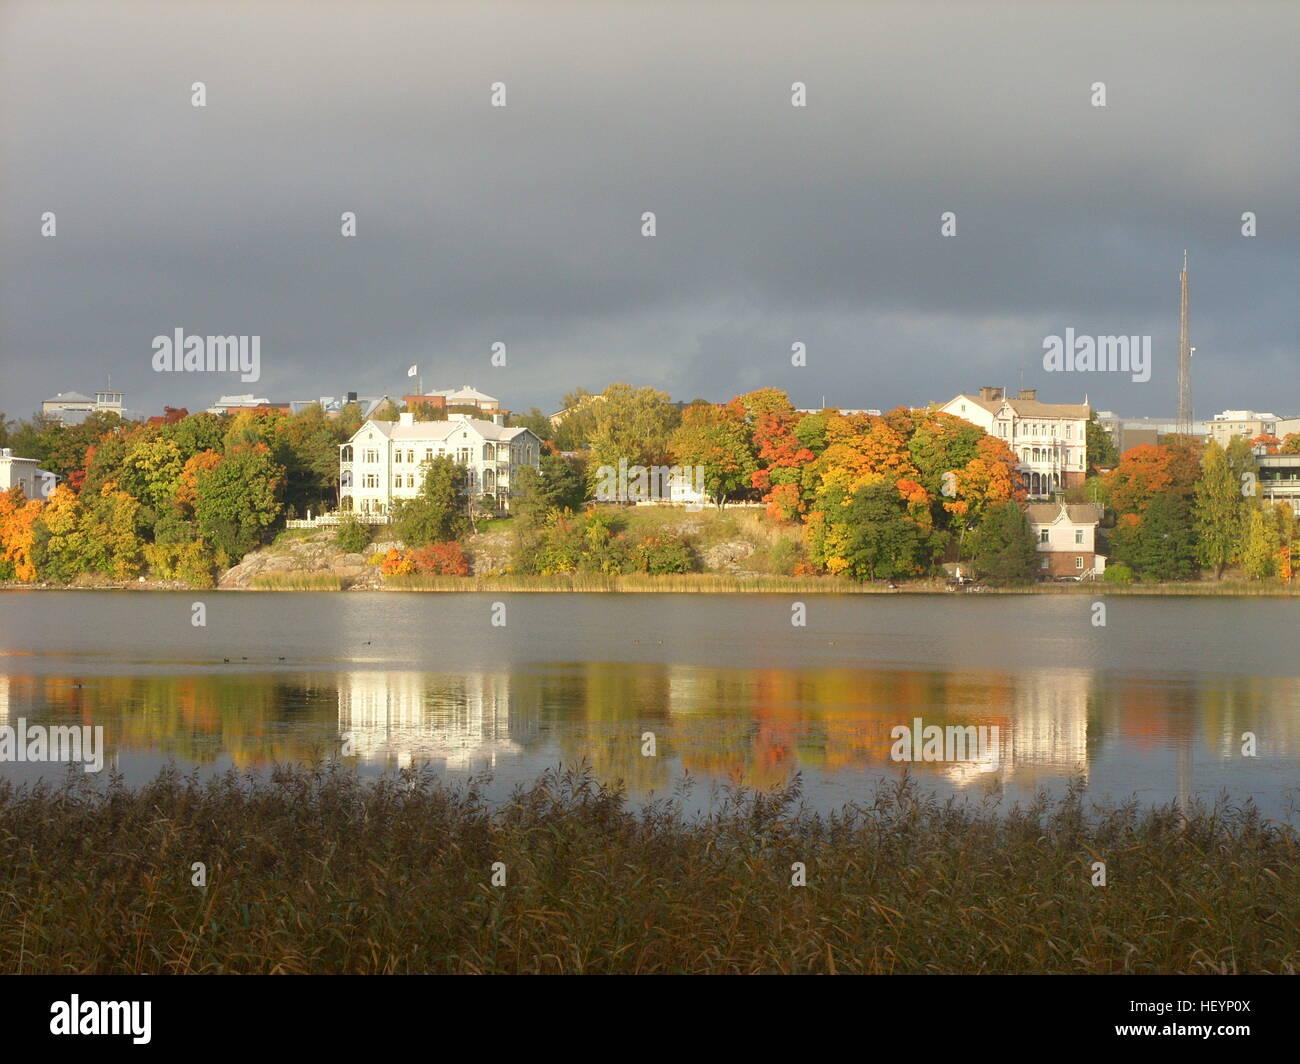 Hesperia Lake Park And Nature Center